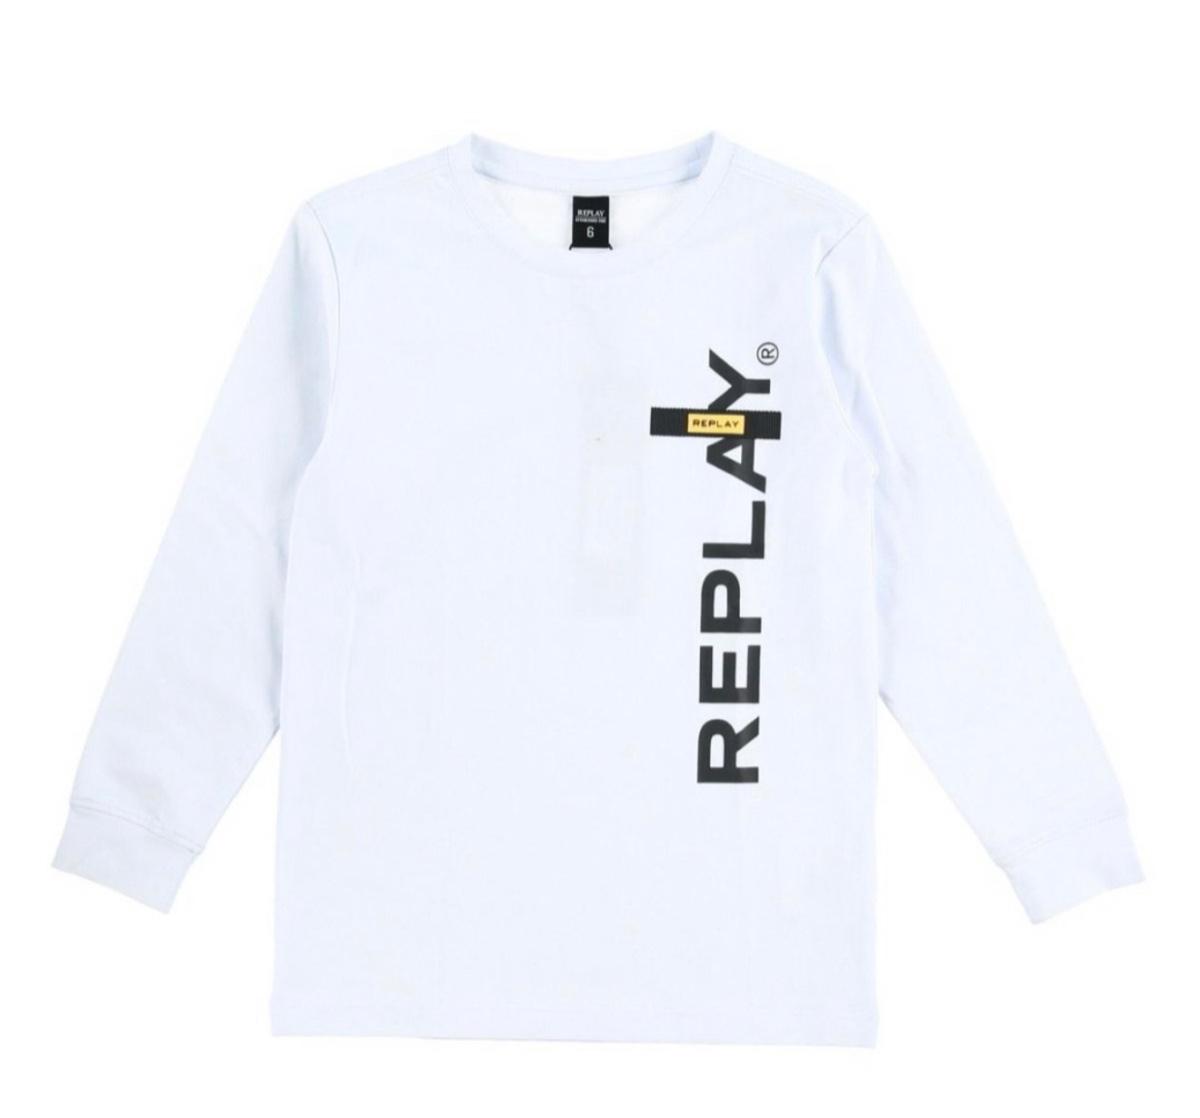 Replay טישרט לבנה שרוול ארוך לוגו צהוב מידות 4-16